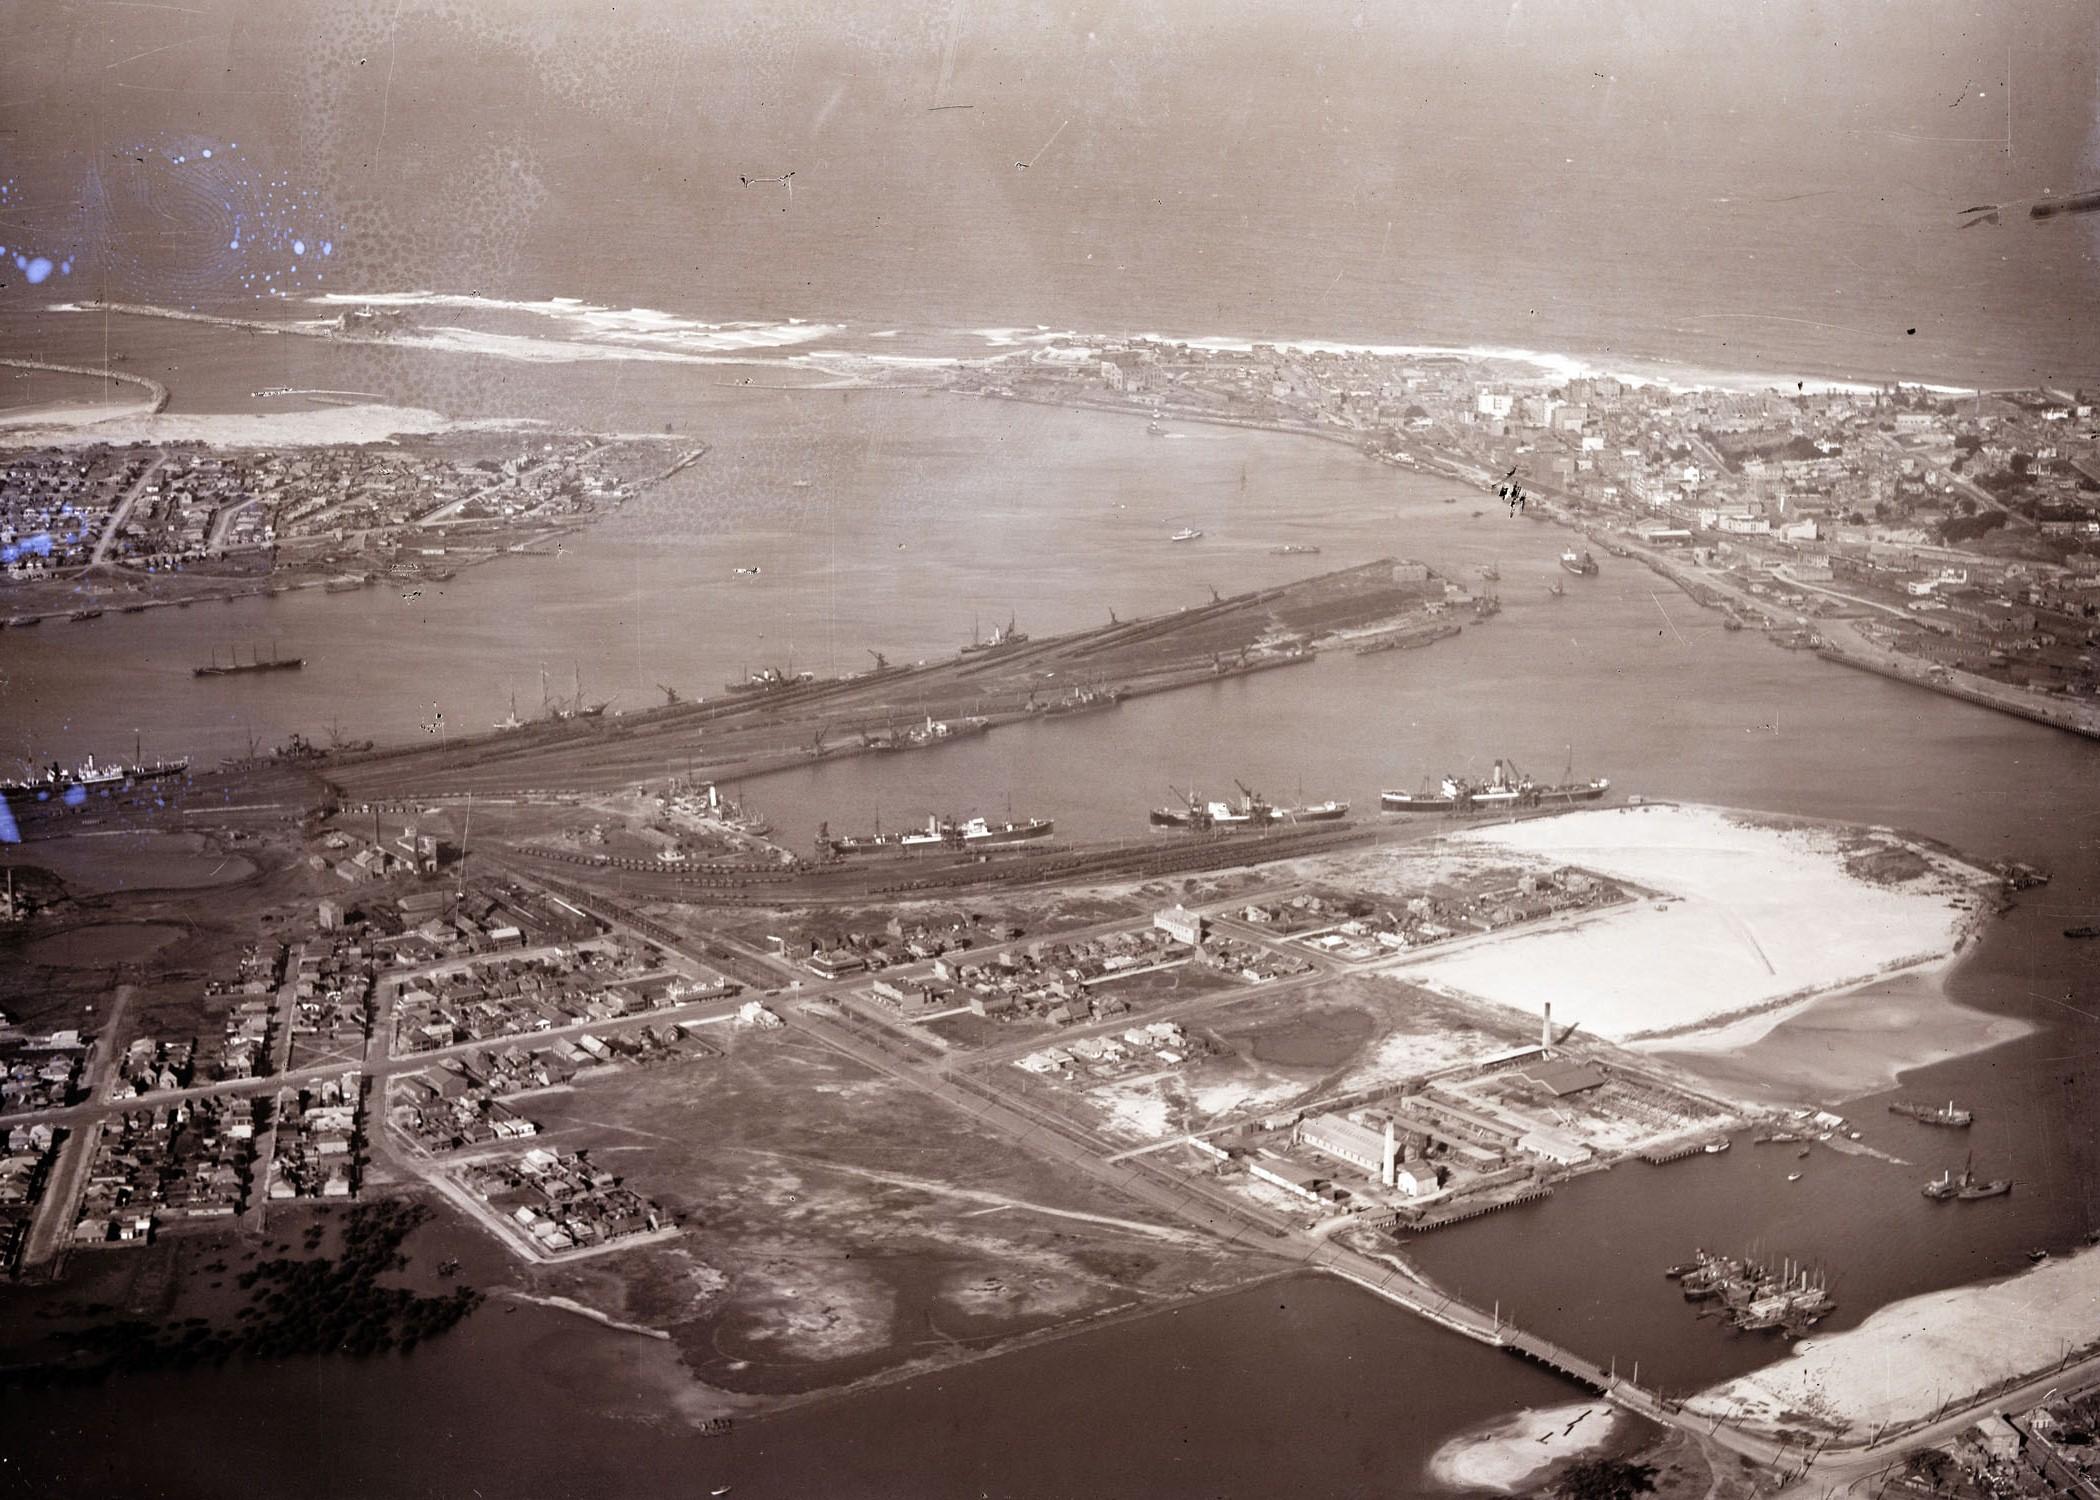 Newcastle harbour looking east, 1930 (Courtesy of Phillip warren)